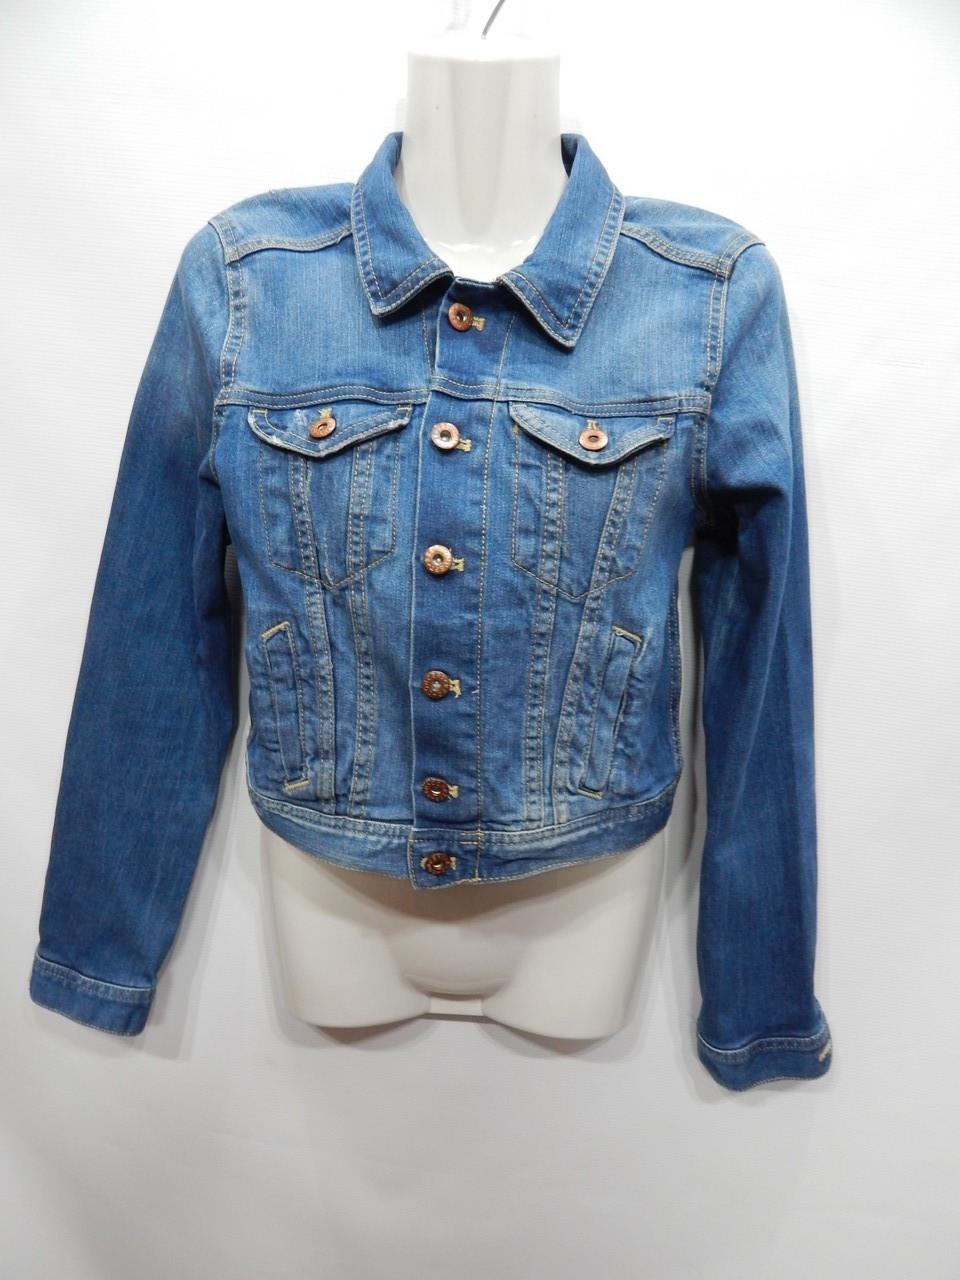 Куртка джинсовая женская DIVIDED Vintage, RUS р.42-44, EUR 34 031DG